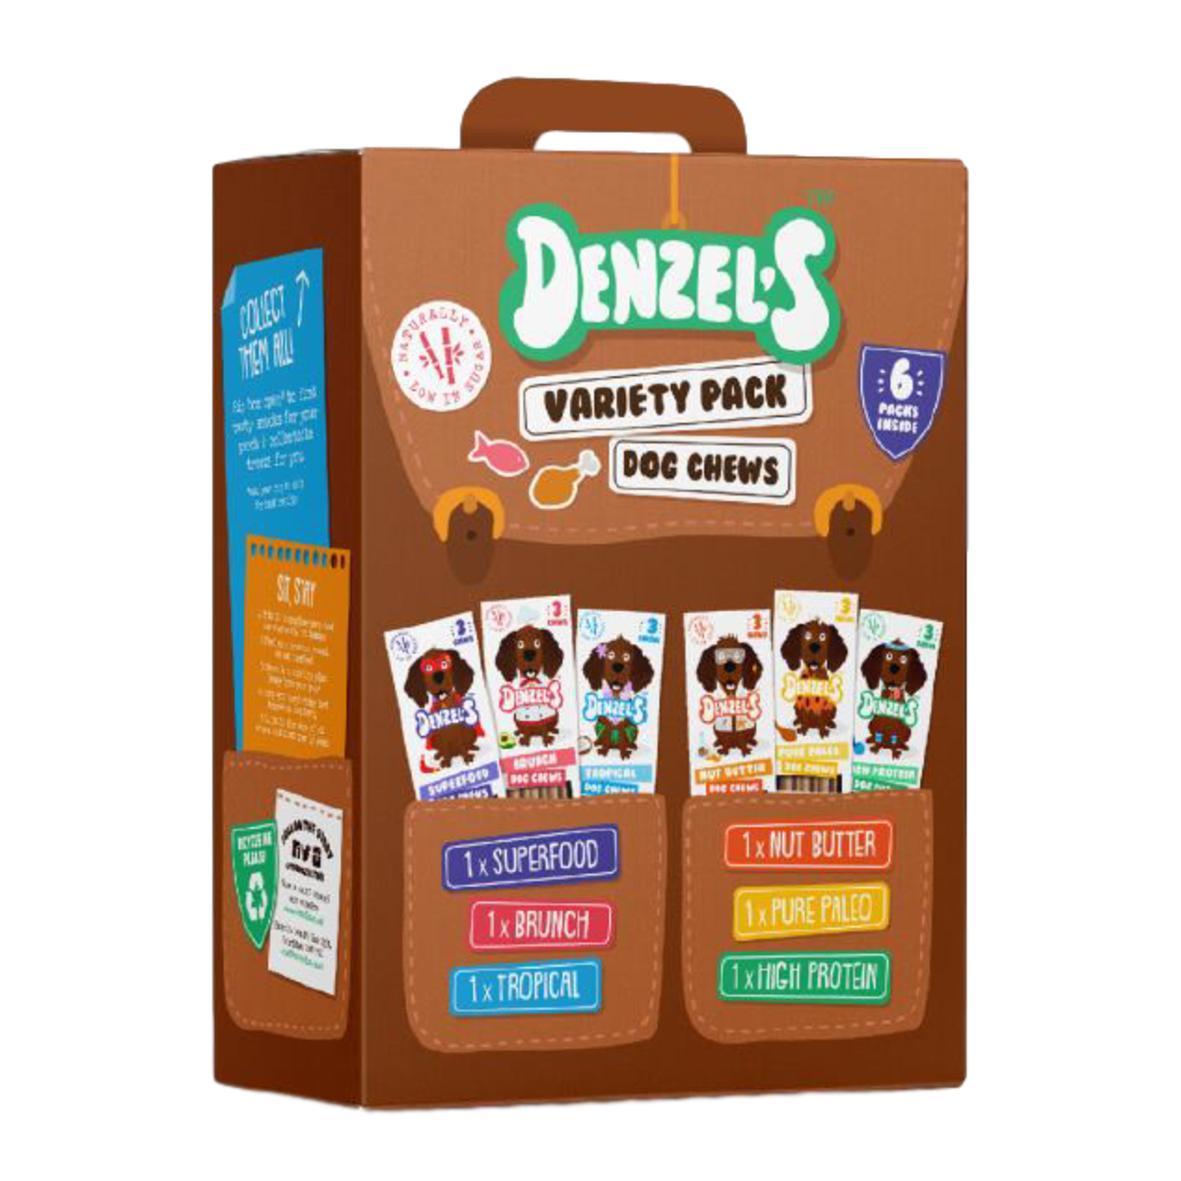 Denzels Variety Pack Dog Chews 6 x 3pk